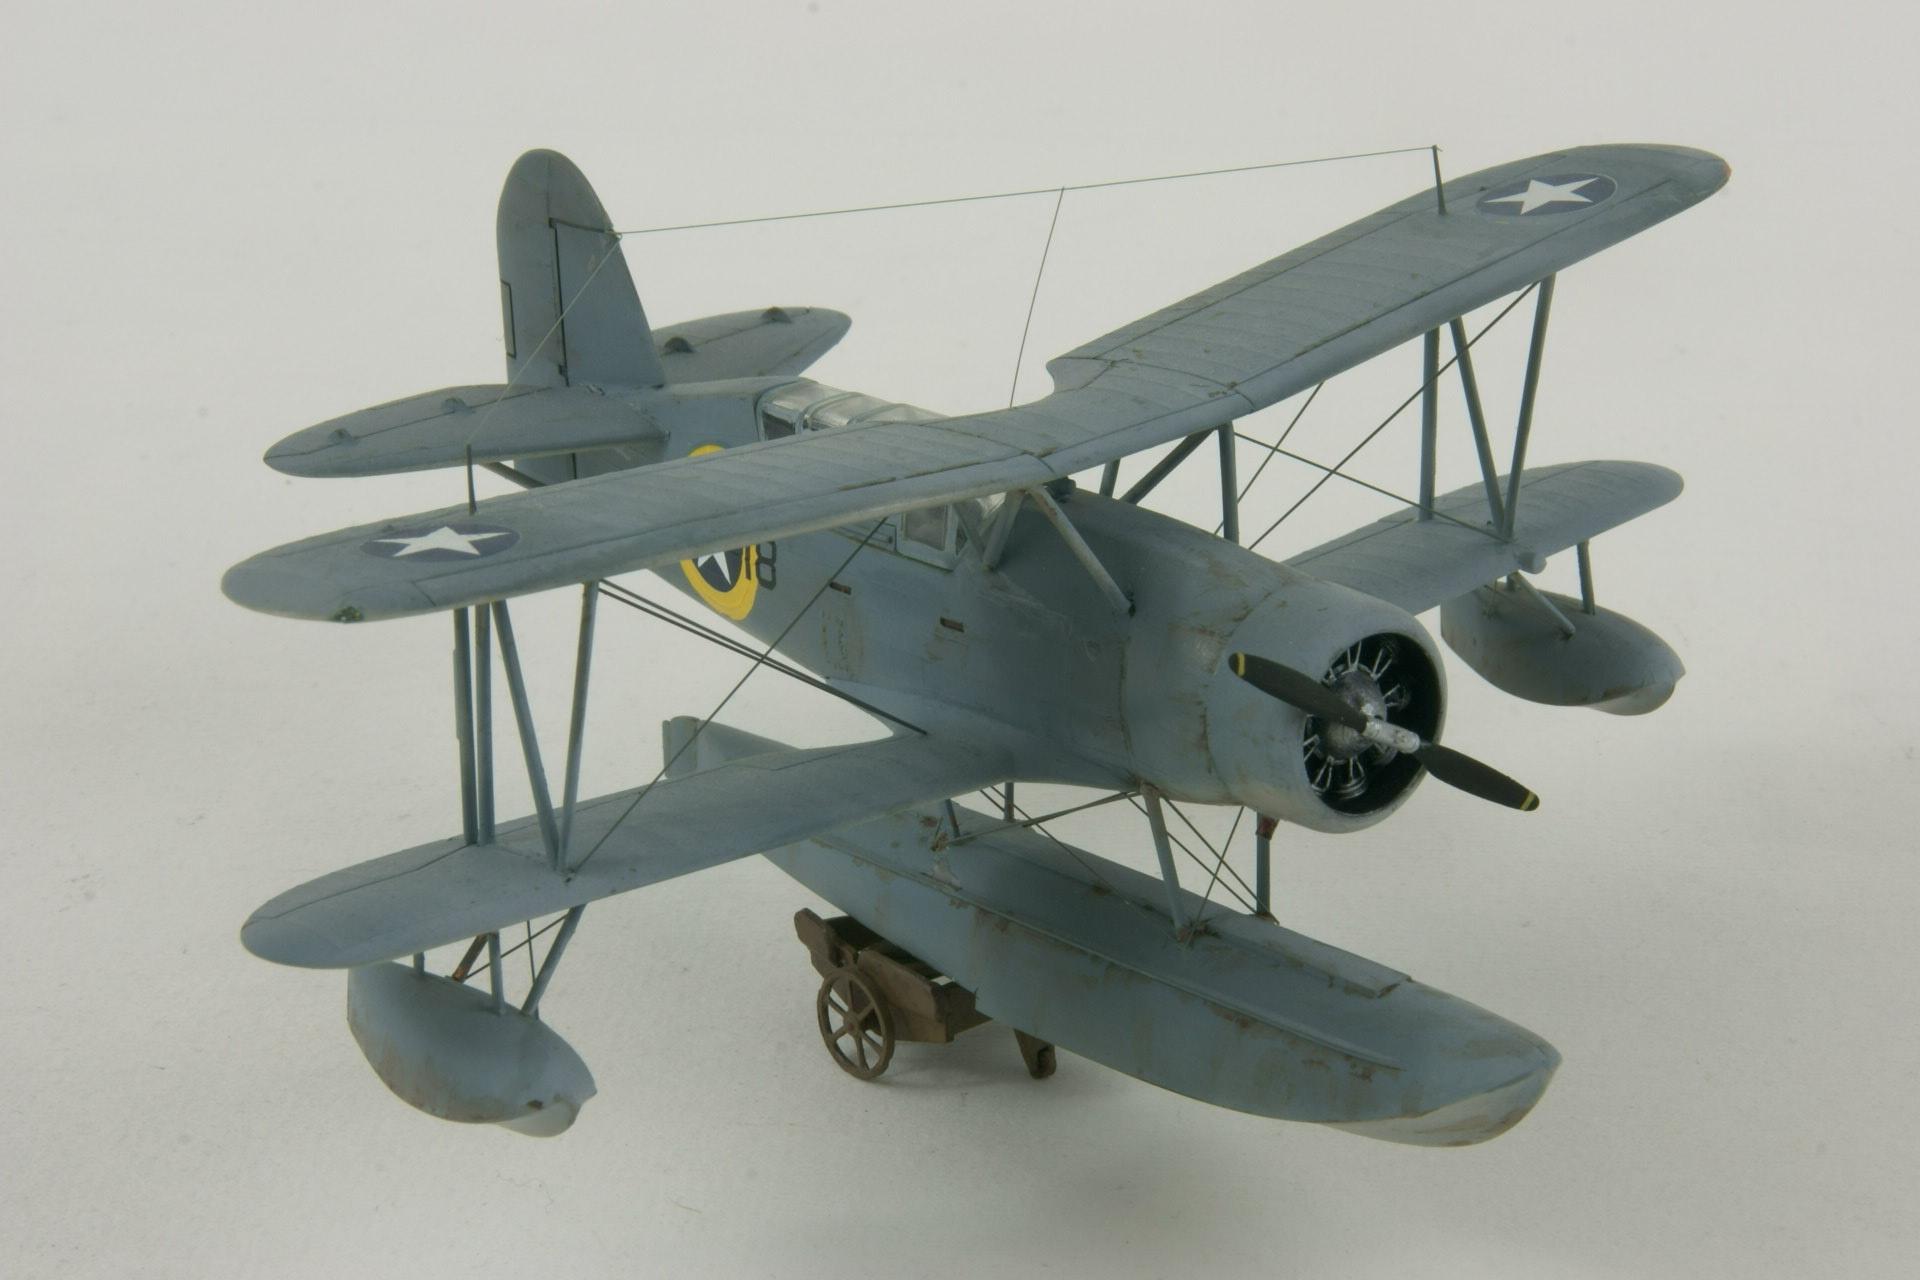 Curtiss soc 2 seagull 4 2